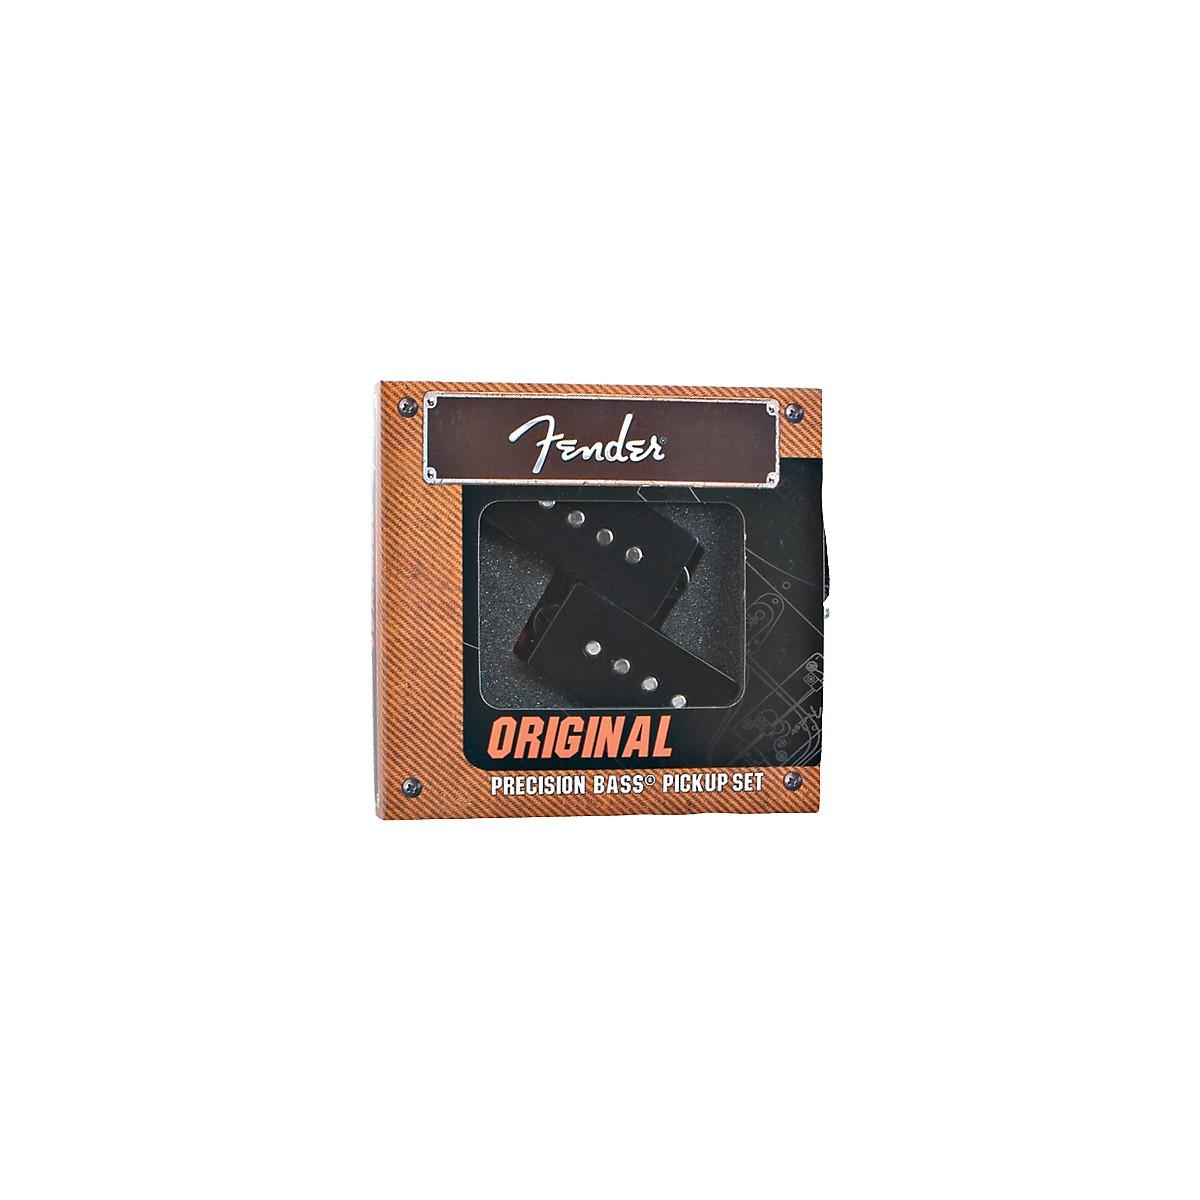 Fender Original 1962 P Bass Pickup